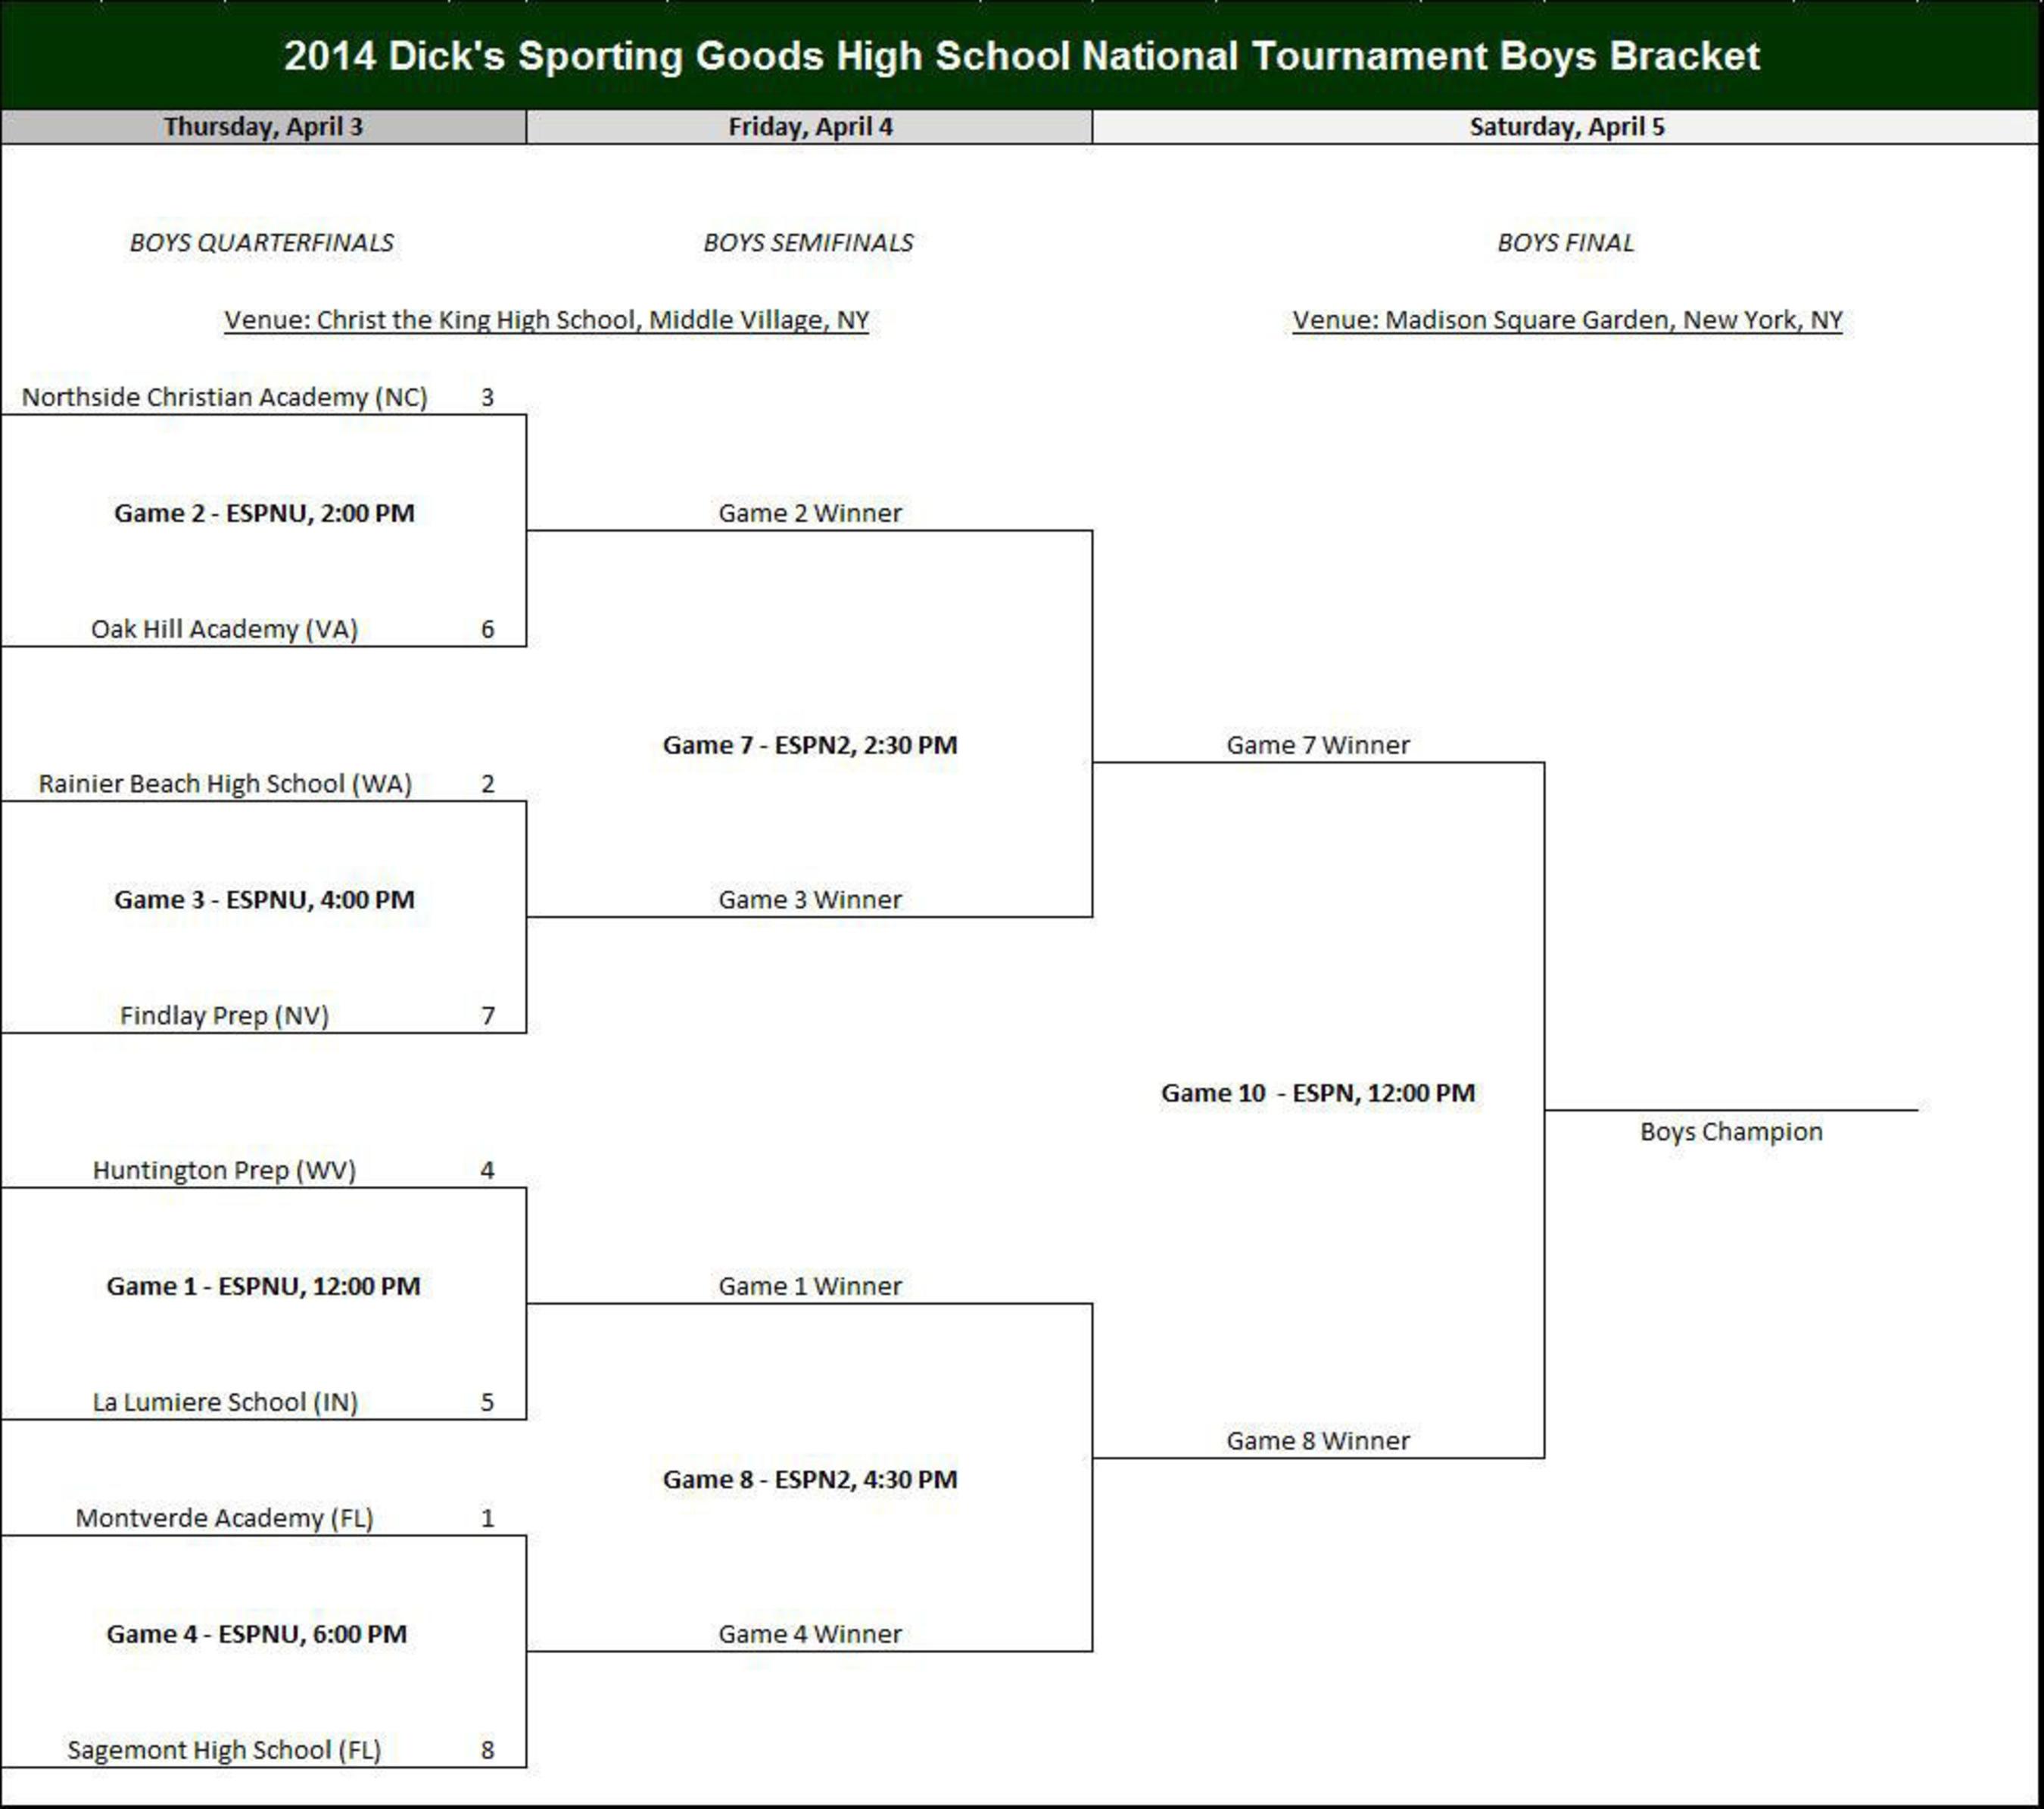 2014 DICK'S Sporting Goods High School National Tournament Boys Bracket. (PRNewsFoto/DICK'S Sporting Goods, Inc.) (PRNewsFoto/DICK'S SPORTING GOODS, INC.)